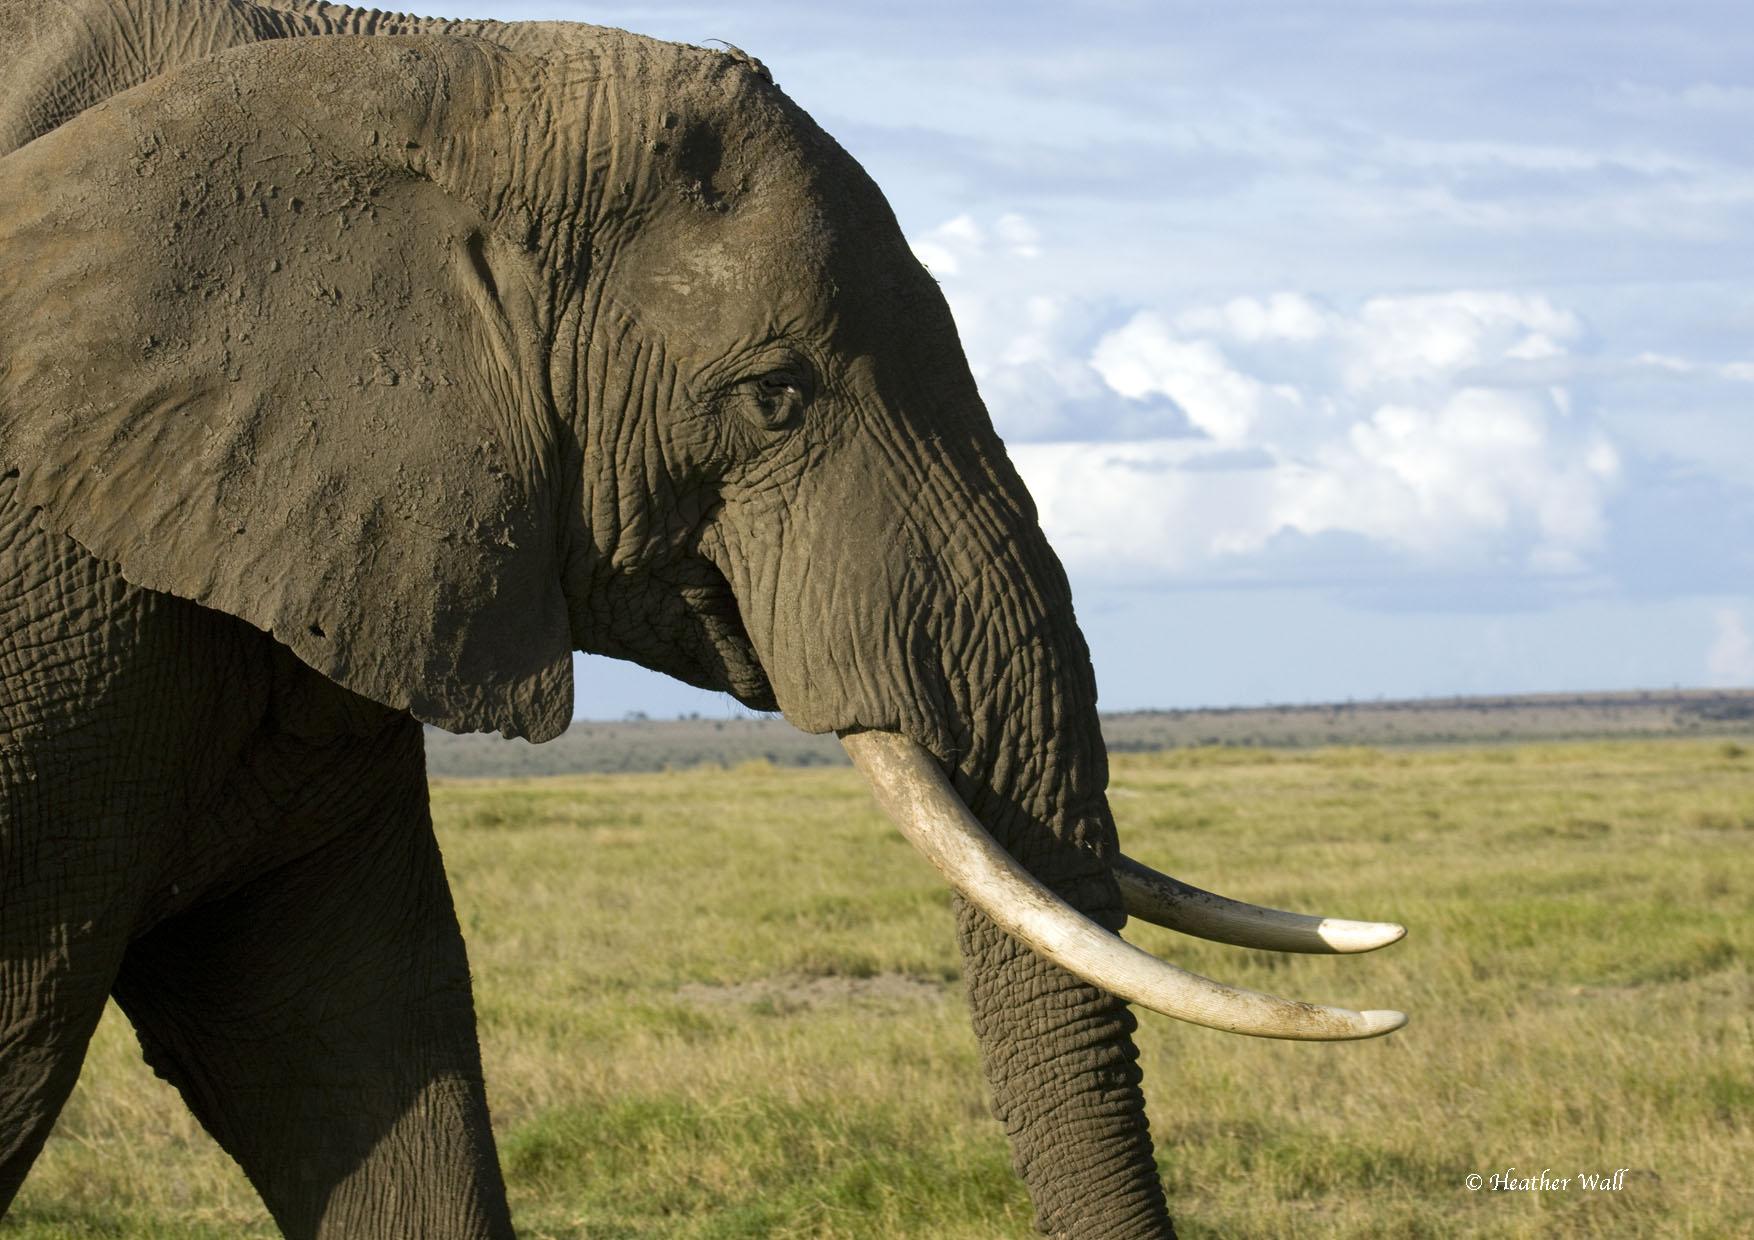 Primary Lessons | Elephanatics